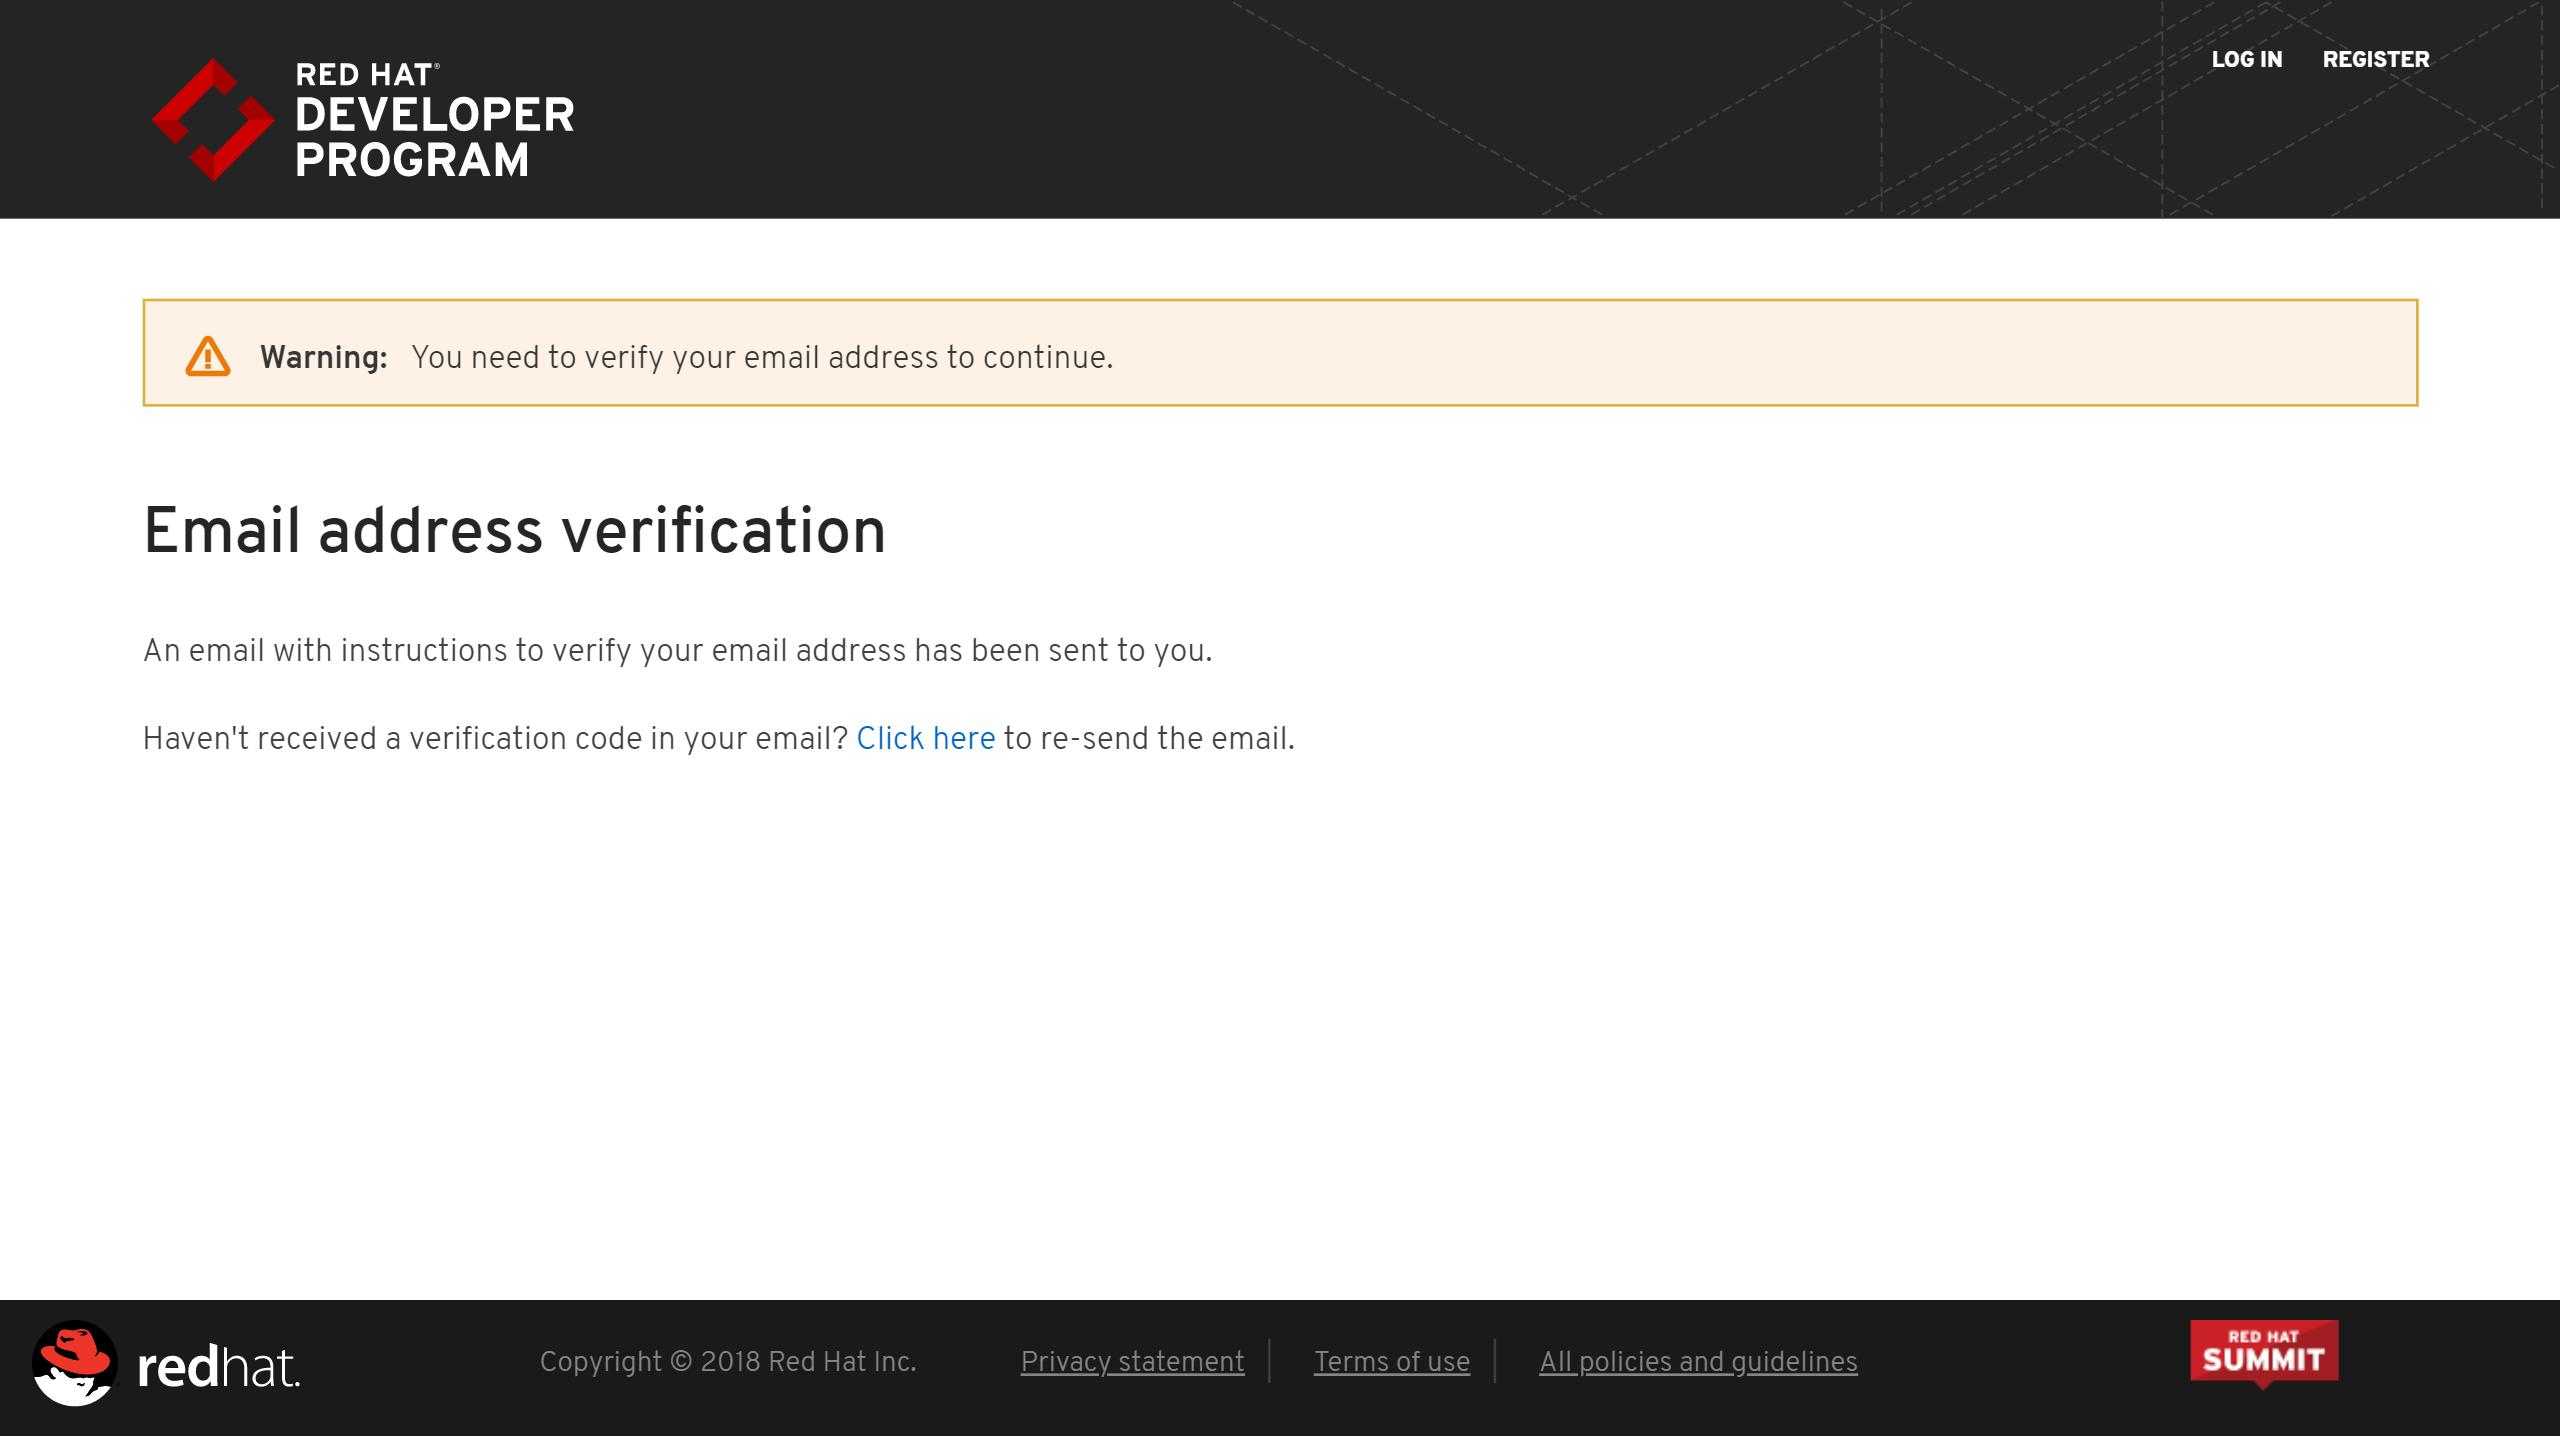 red-hat-developer-program-mail-address-verification